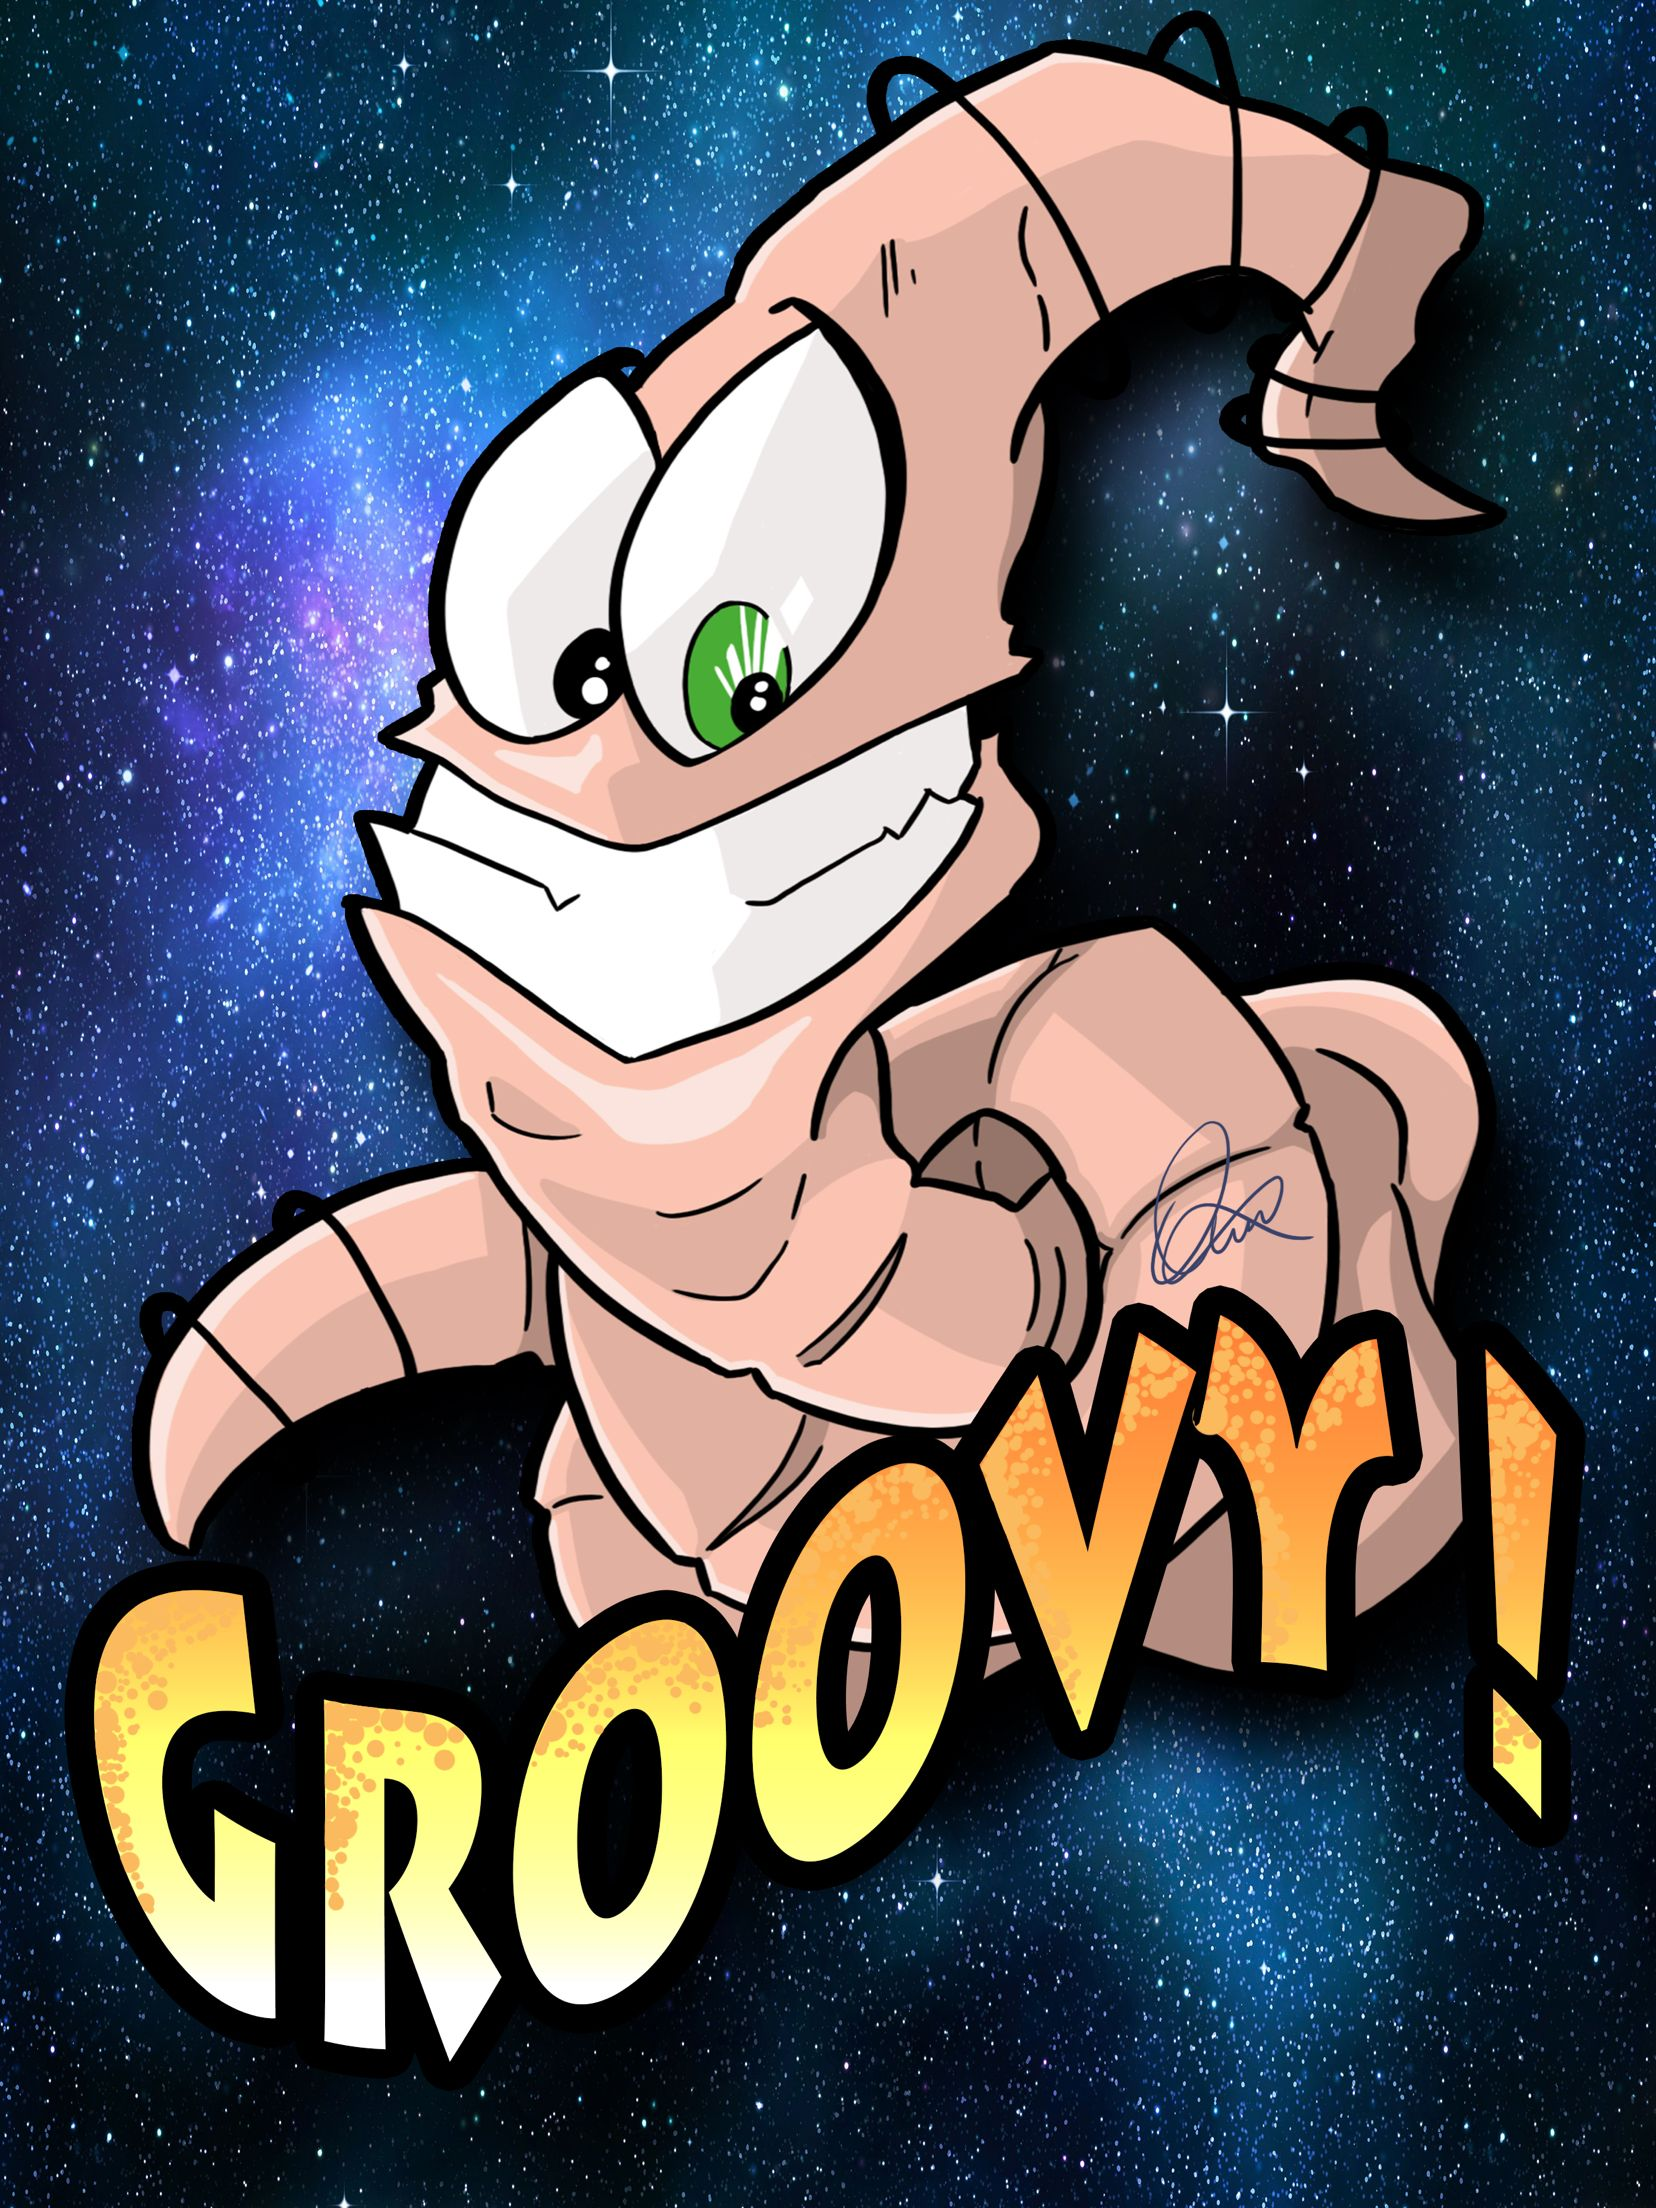 Earthworm Jim.   Follow me on Instagram and Twitter @omgxero